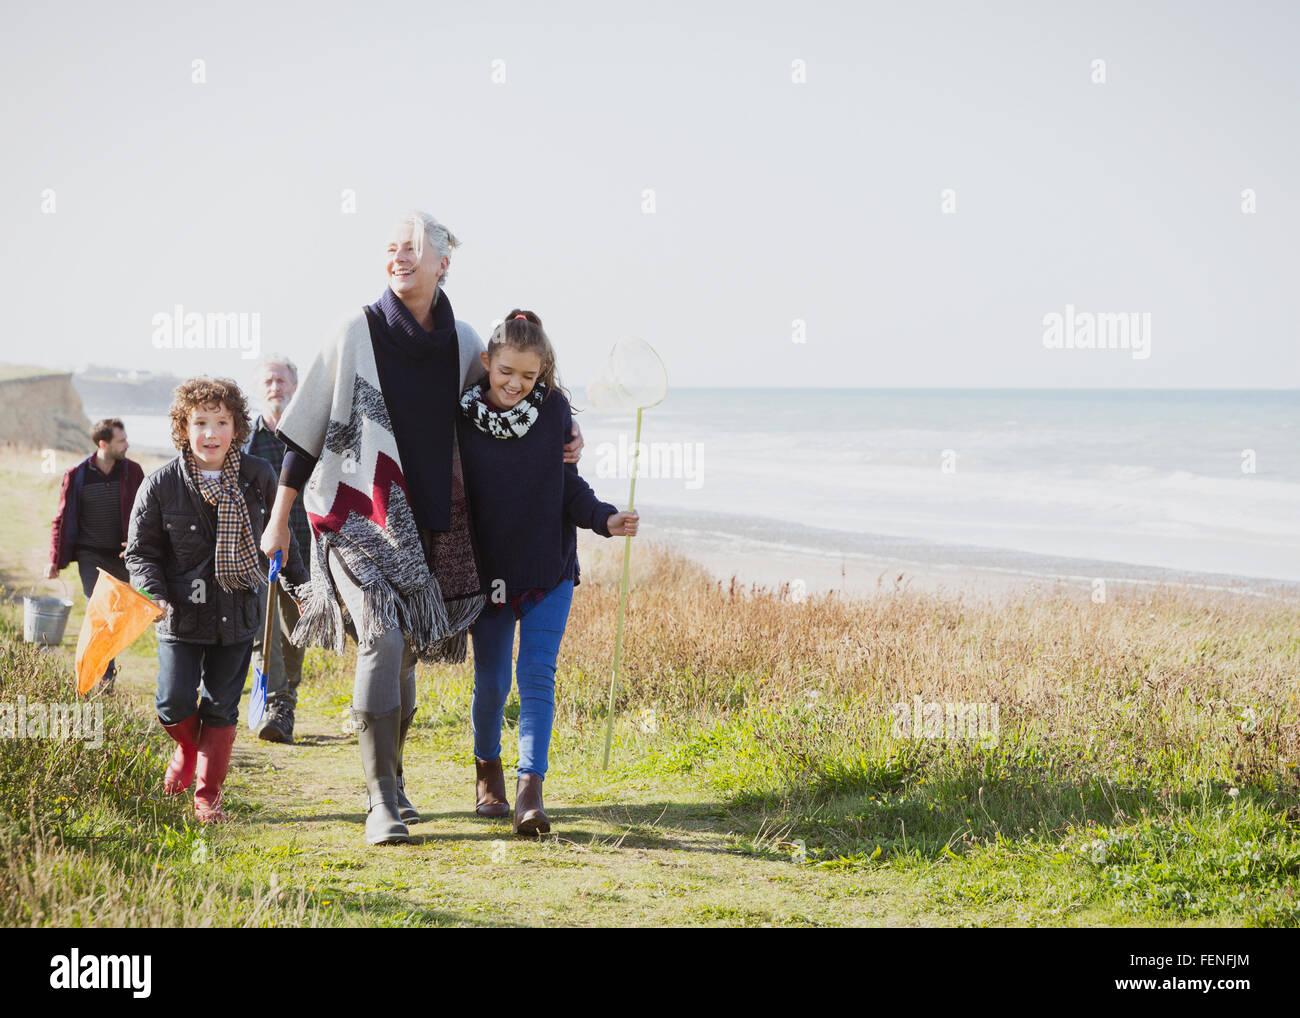 Multi-generation family walking on grassy beach path Stock Photo